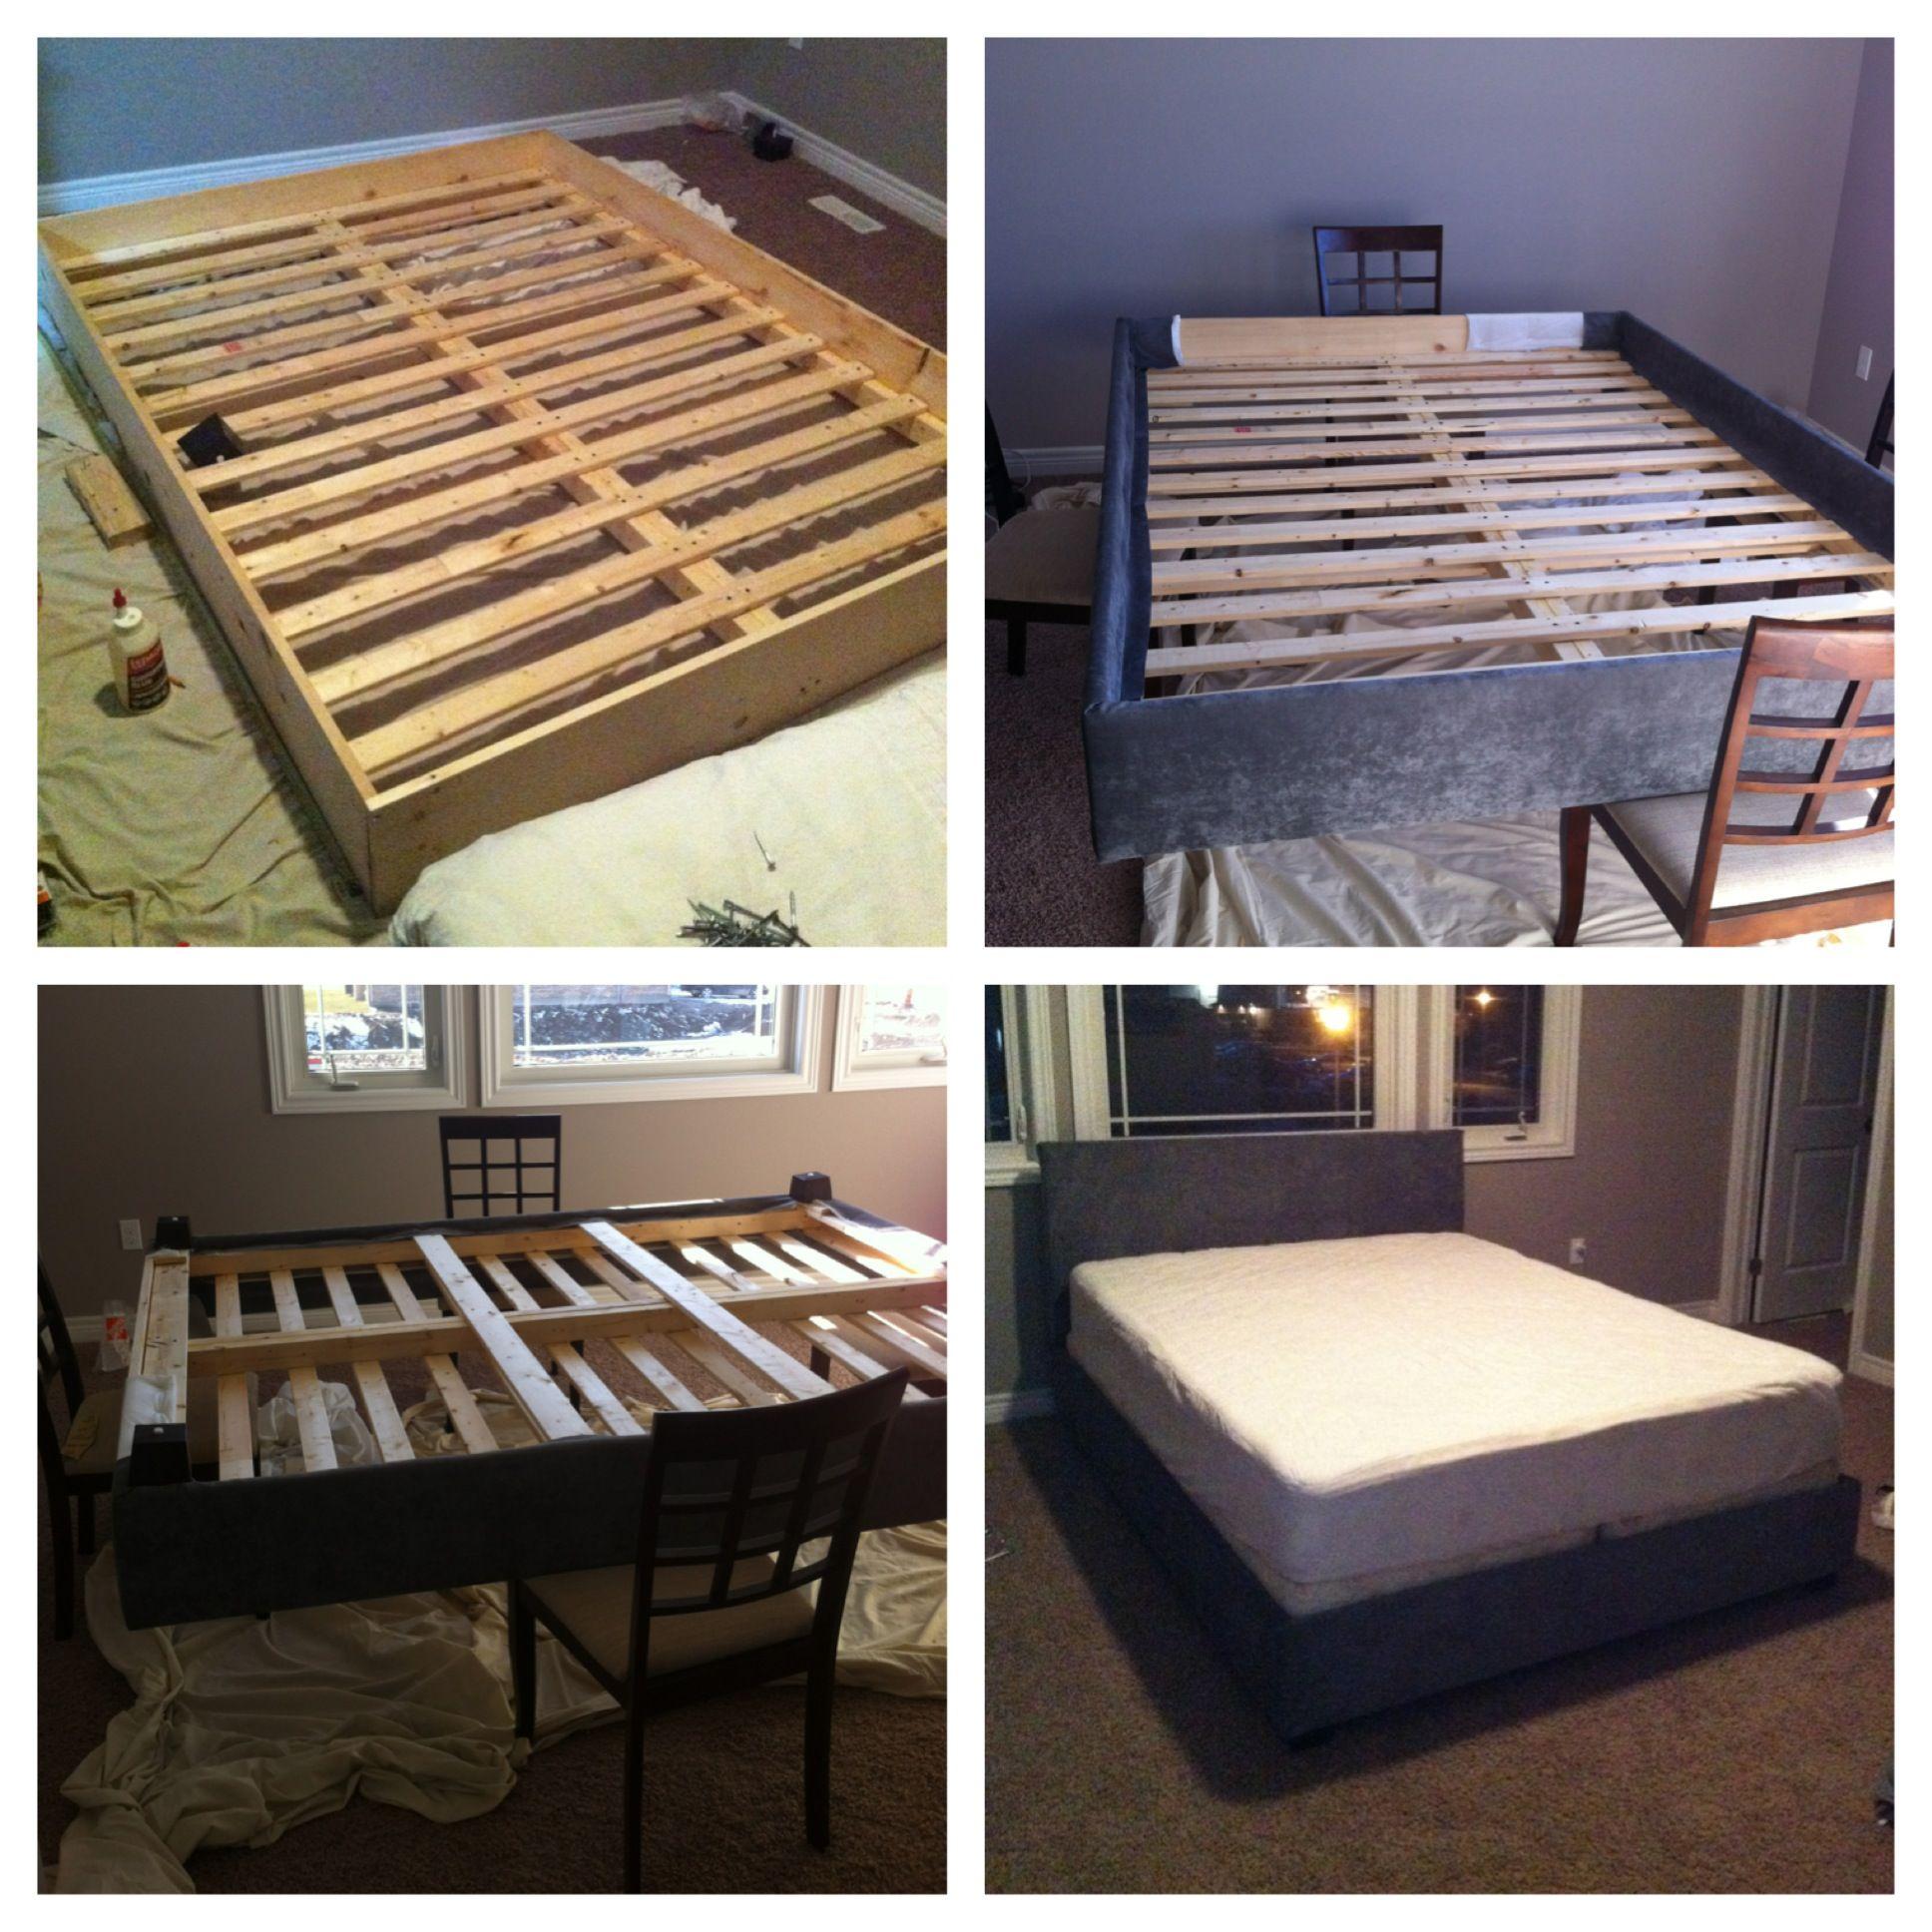 diy platform bed instructions we mostly followed http high